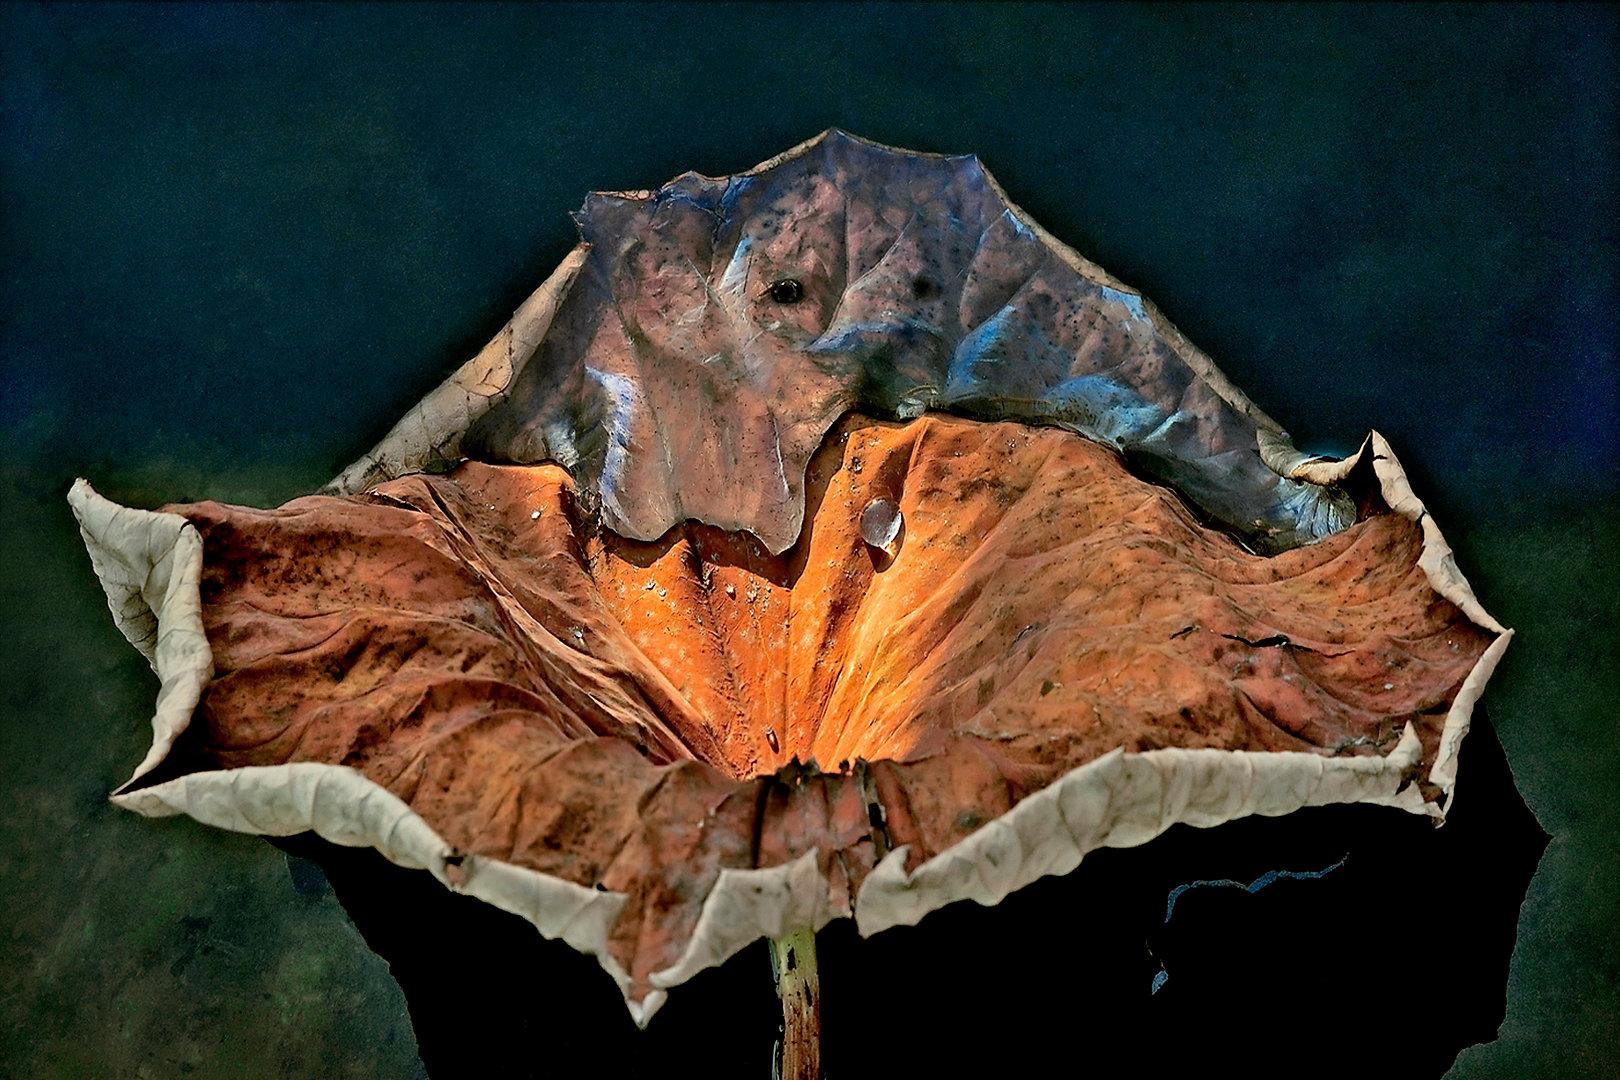 LOTUS Nº 2  Large format fine art photograph by Denis Eugene Robert on TRAGART